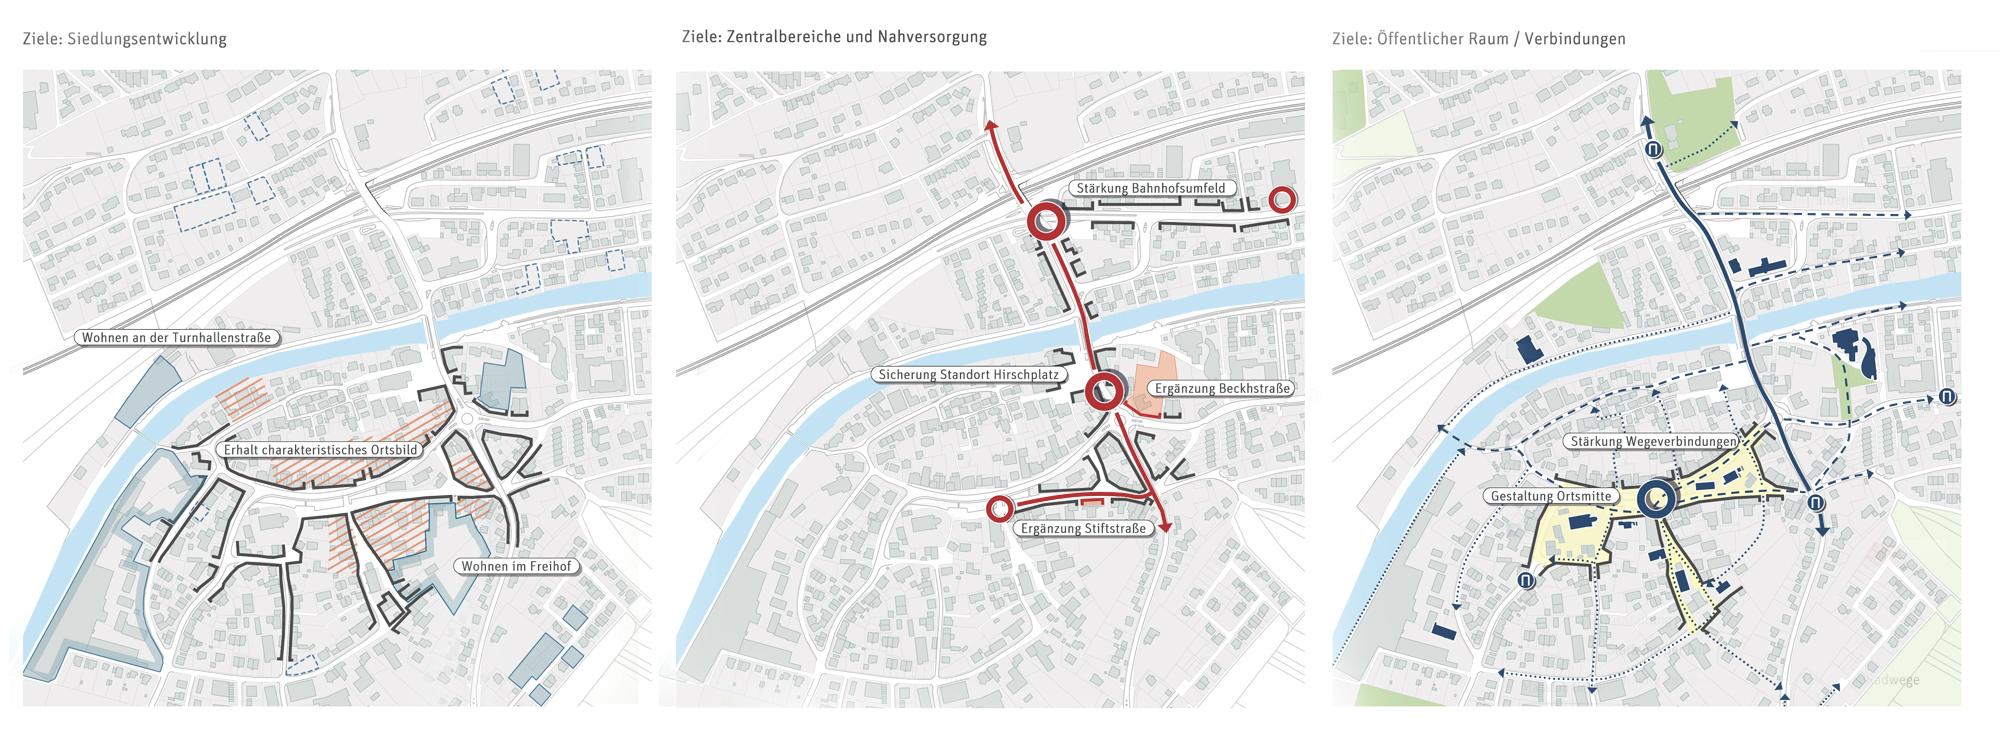 ppas_Stadtteilentwicklung_Göppingen Faurndau_Ortskern_Ziele